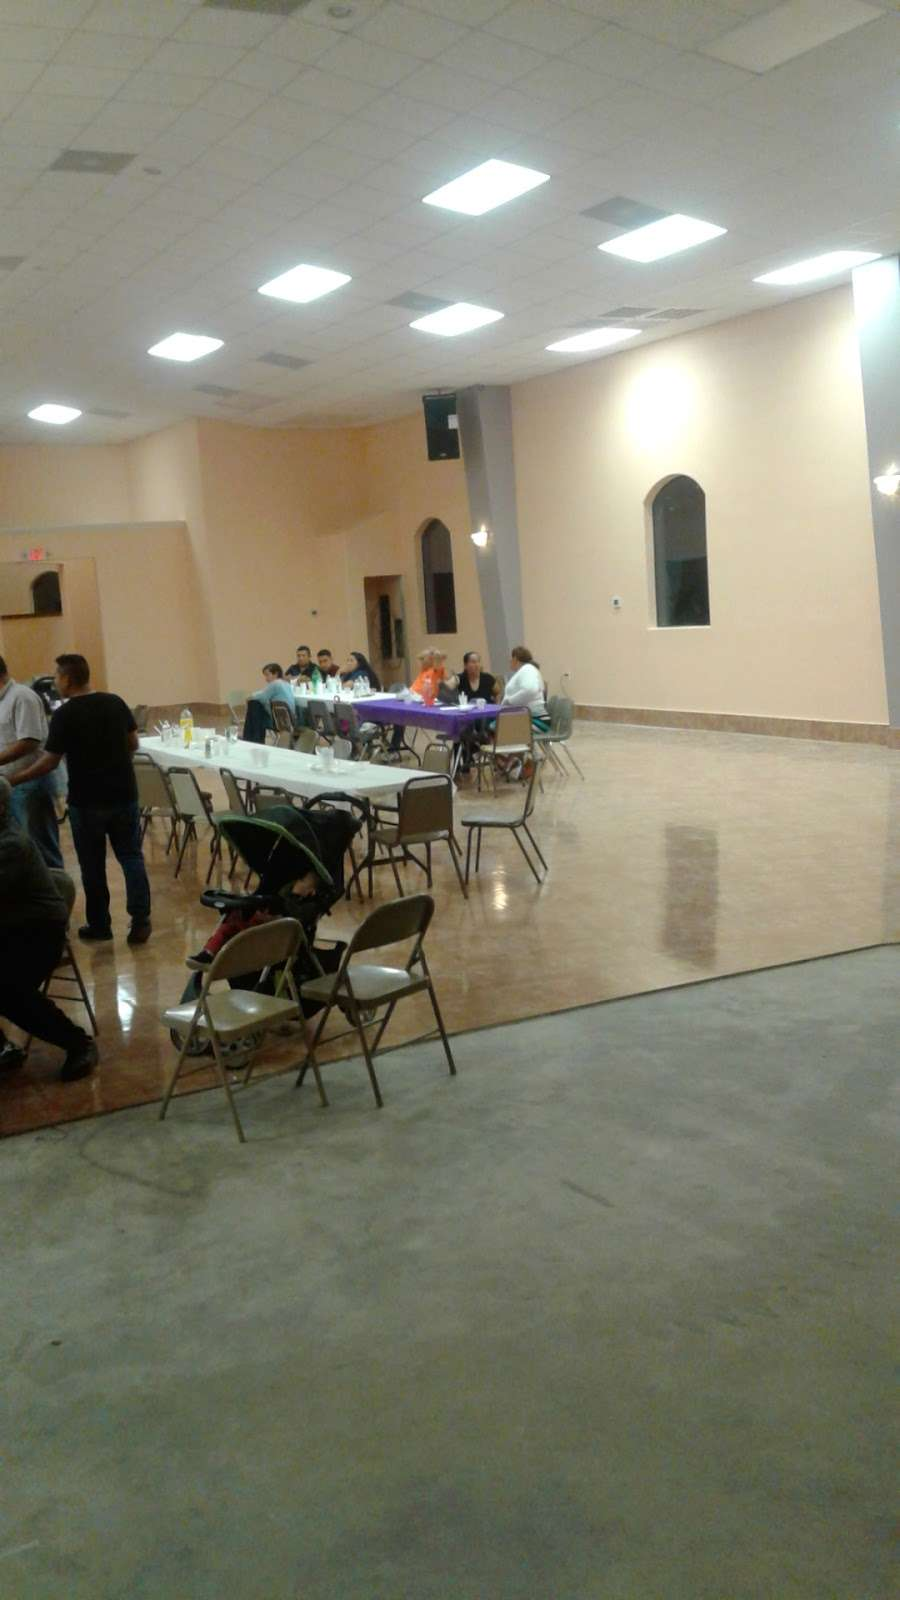 Iglesia De Dios Fuente De Vida - church  | Photo 8 of 10 | Address: 3125 Frick Rd, Houston, TX 77038, USA | Phone: (713) 498-0609